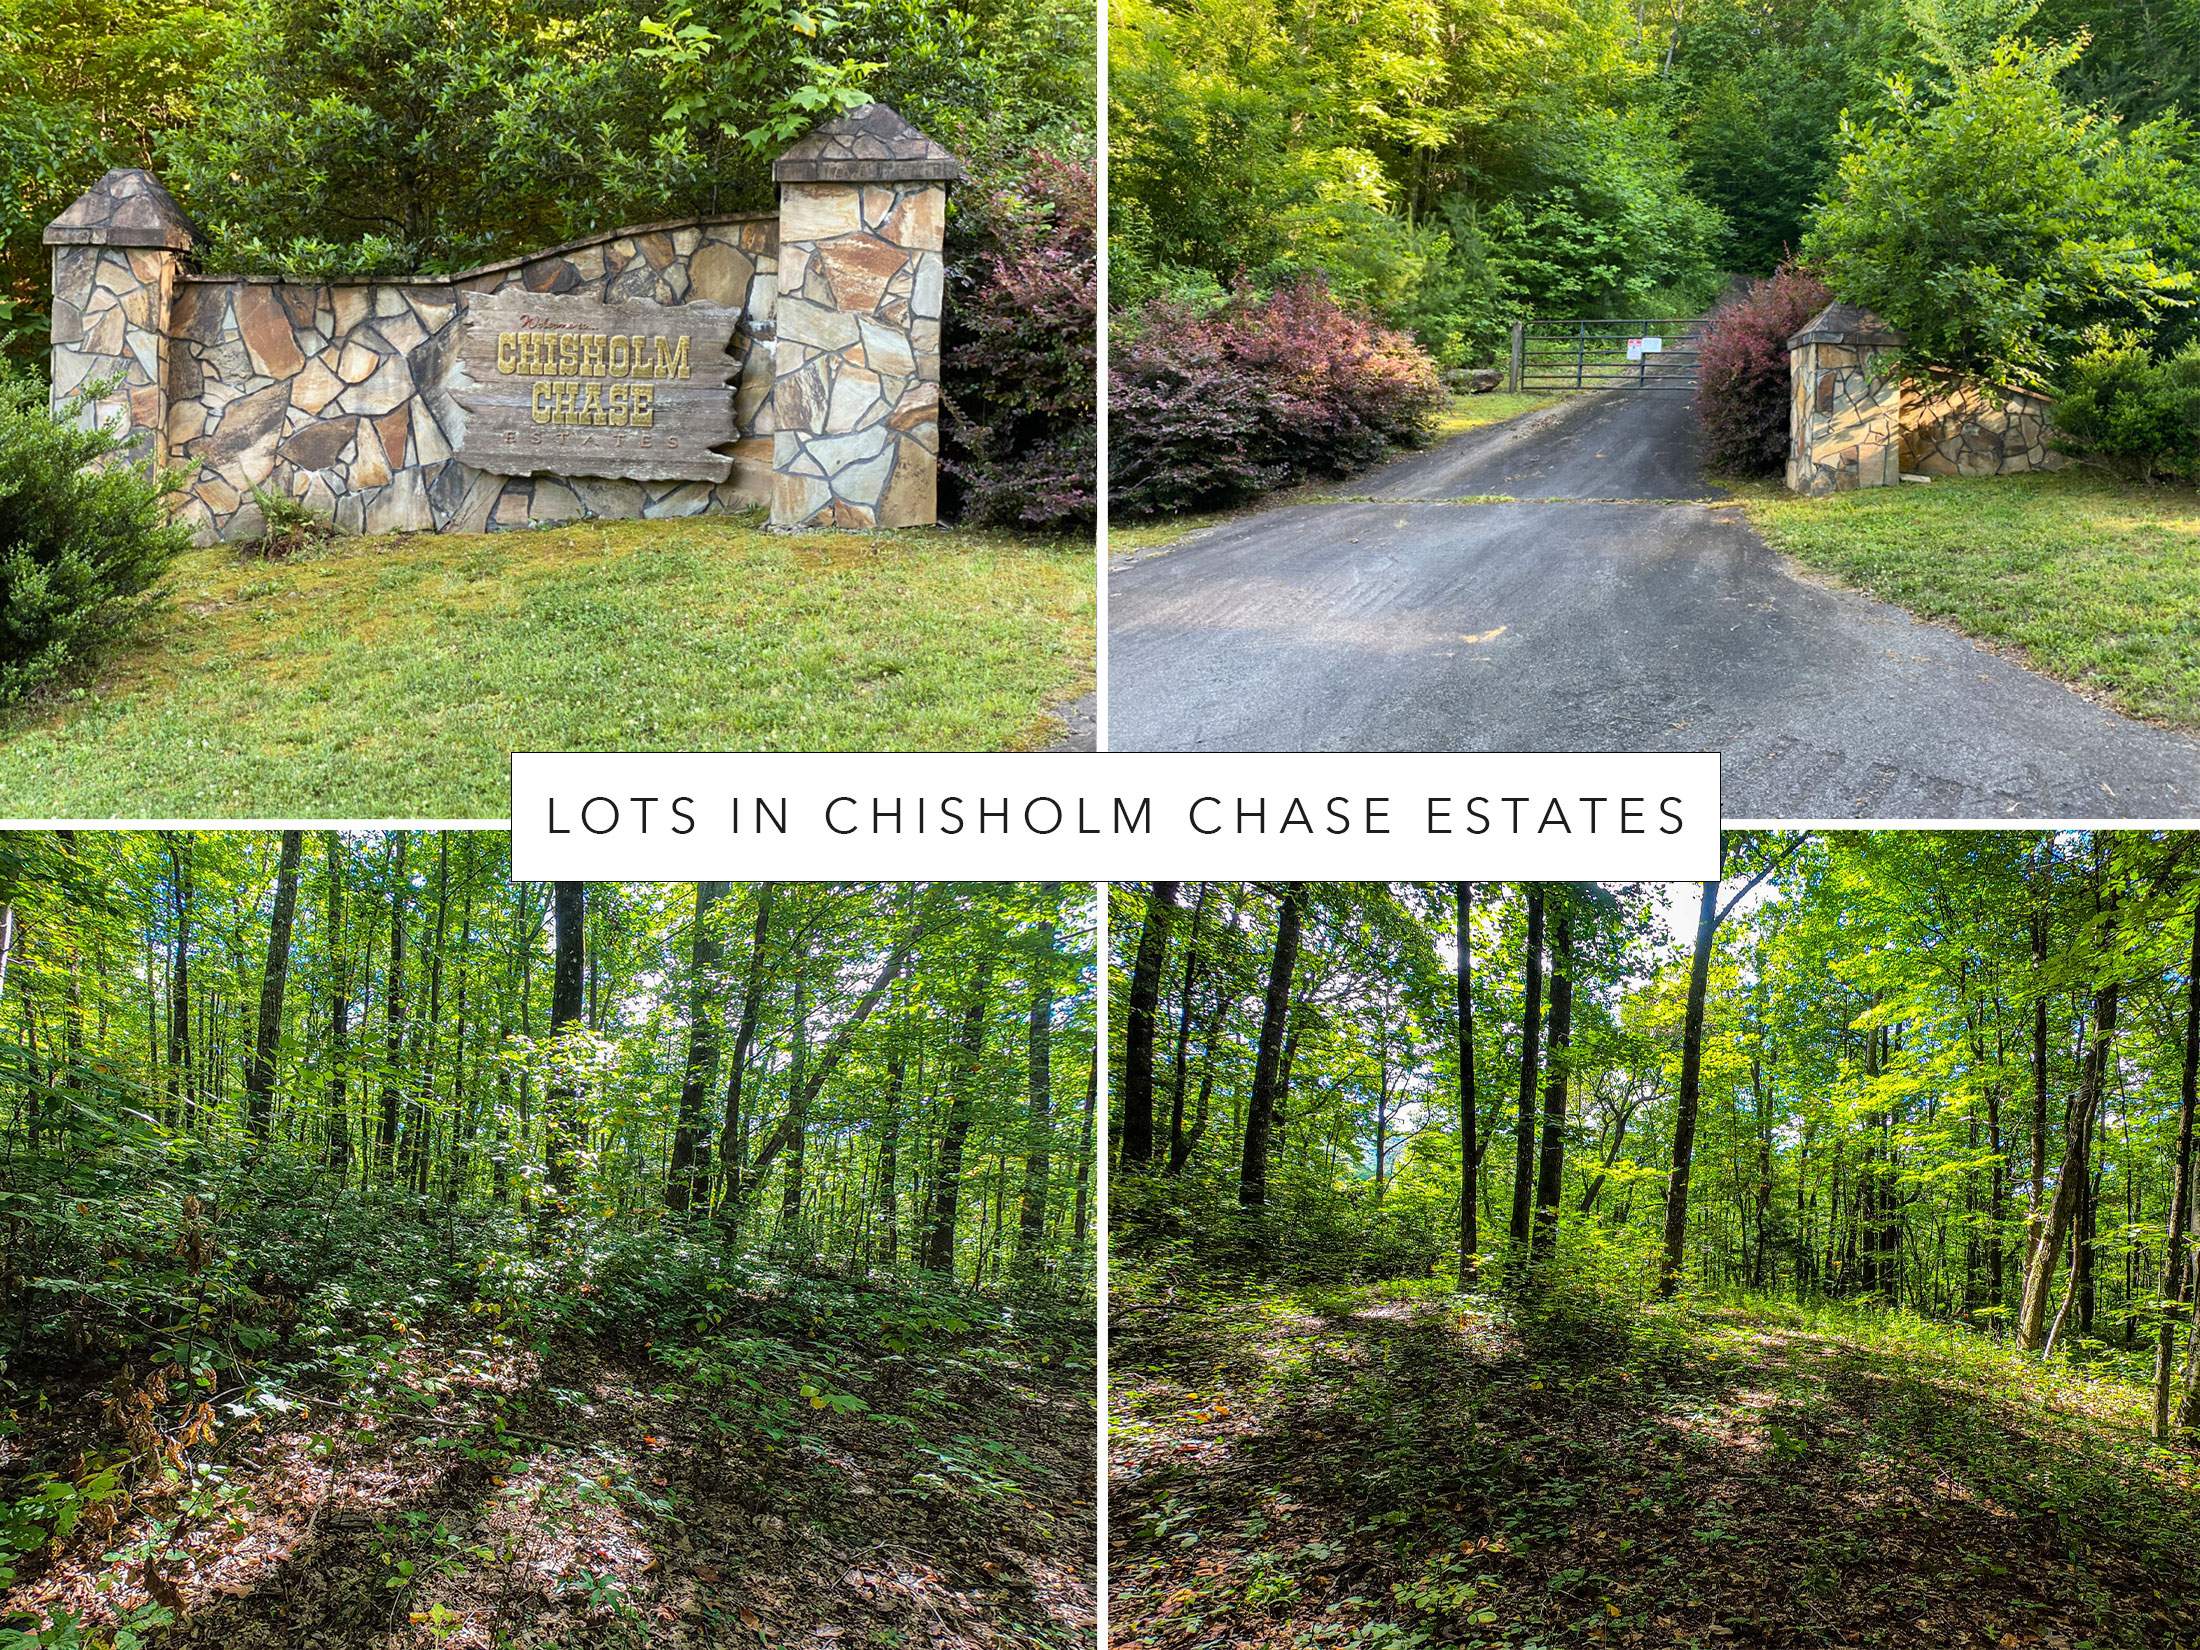 Lots-in-Chisholm-Chase-Estates